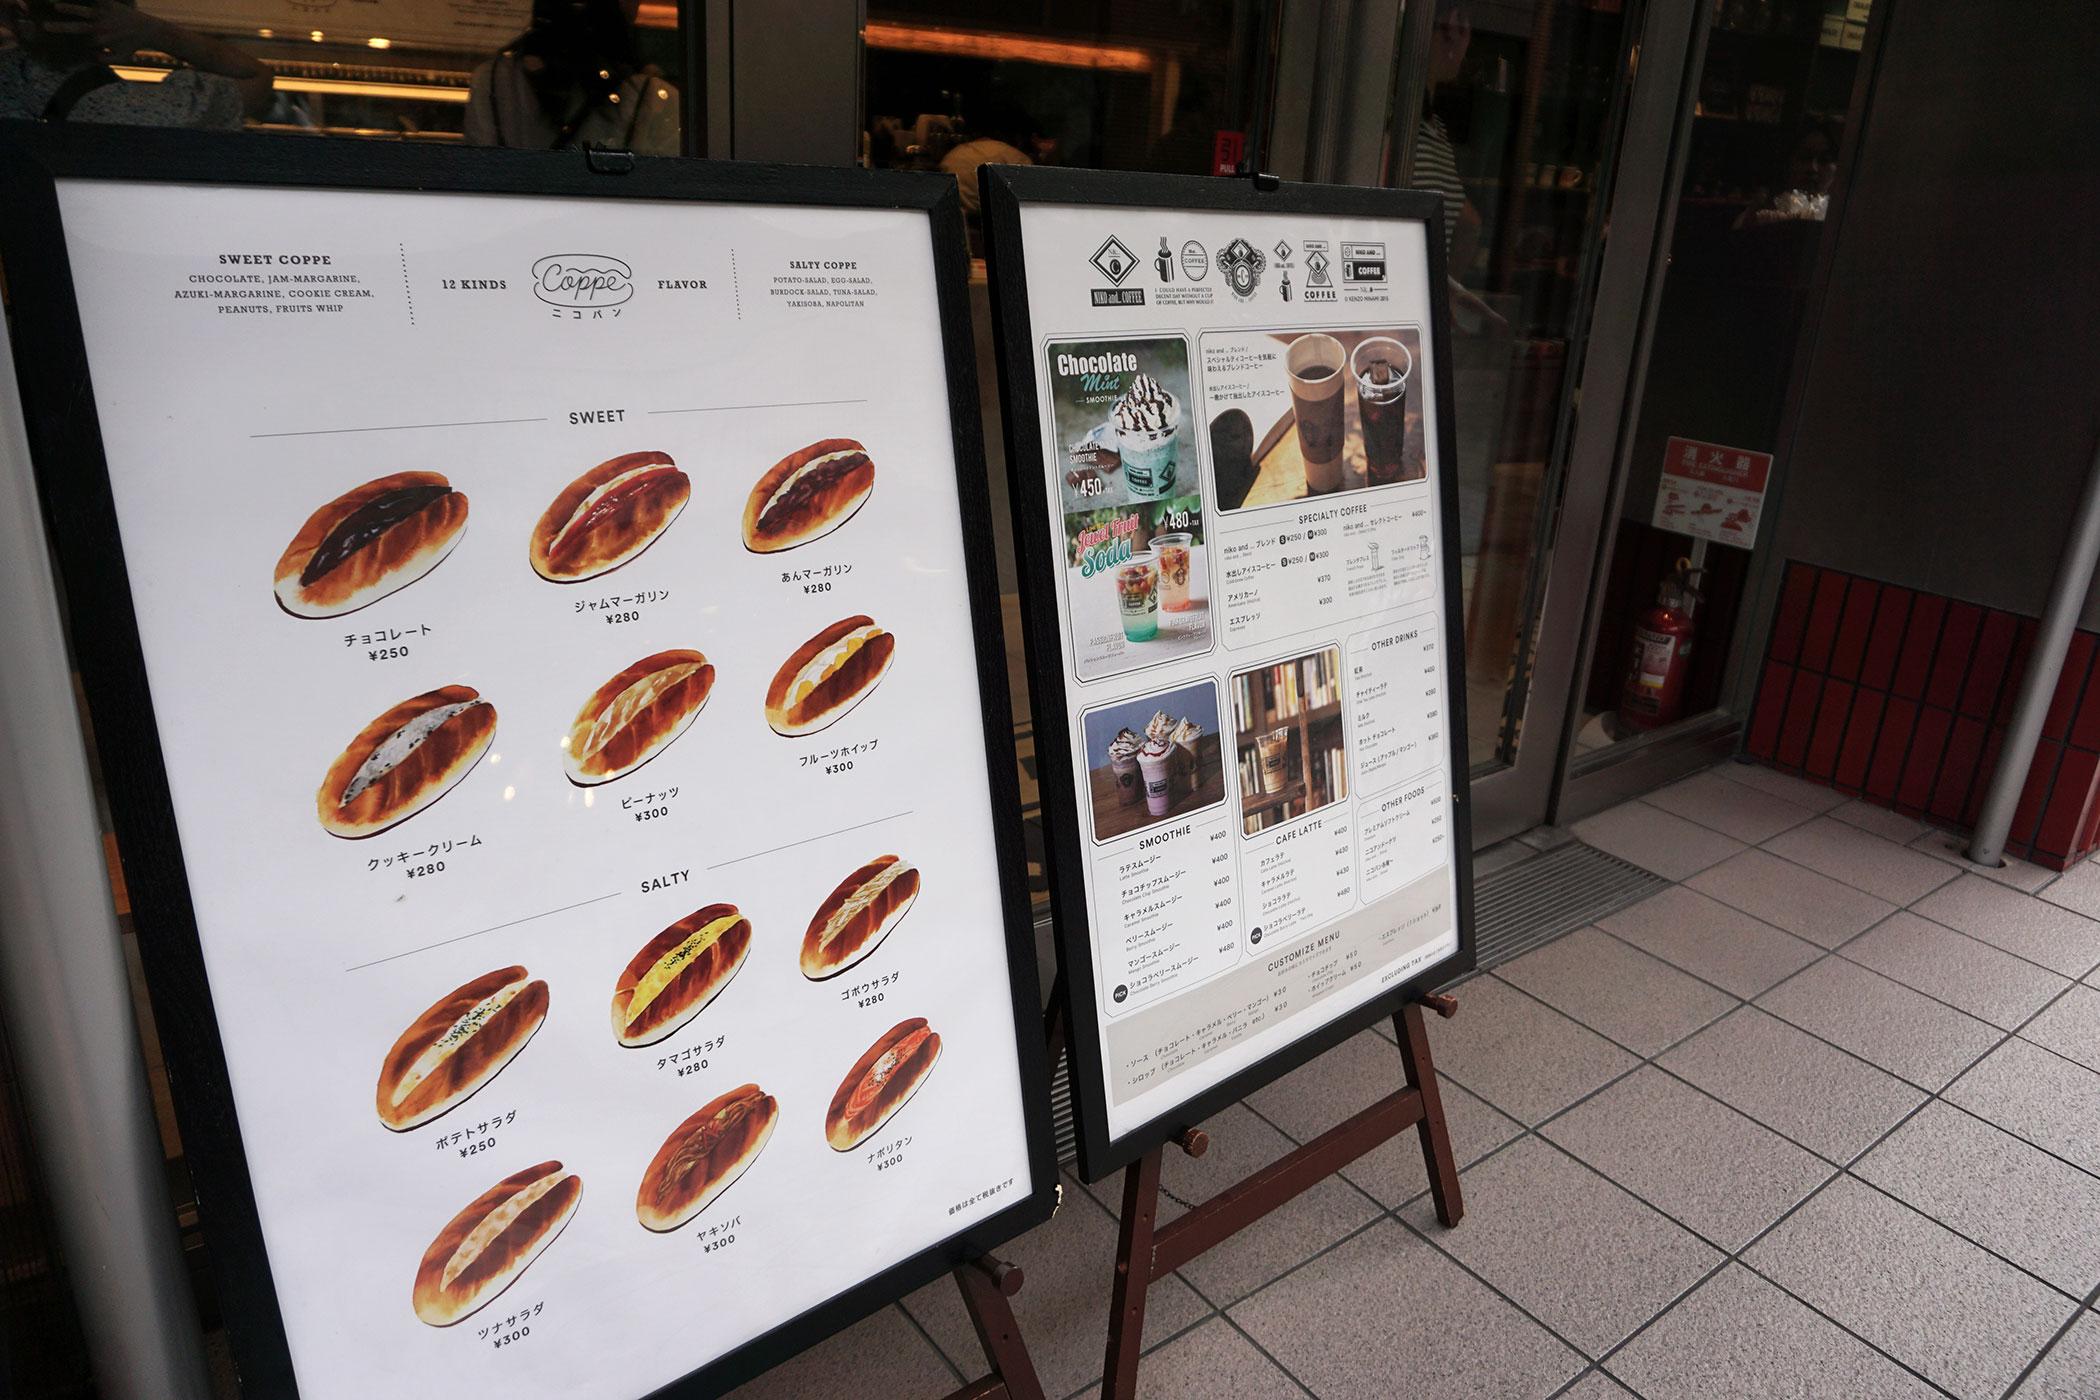 niko and … COFFEE HEP FIVE店 カフェもメンズもウィメンズも…なんだ誰でも楽しめるじゃん!